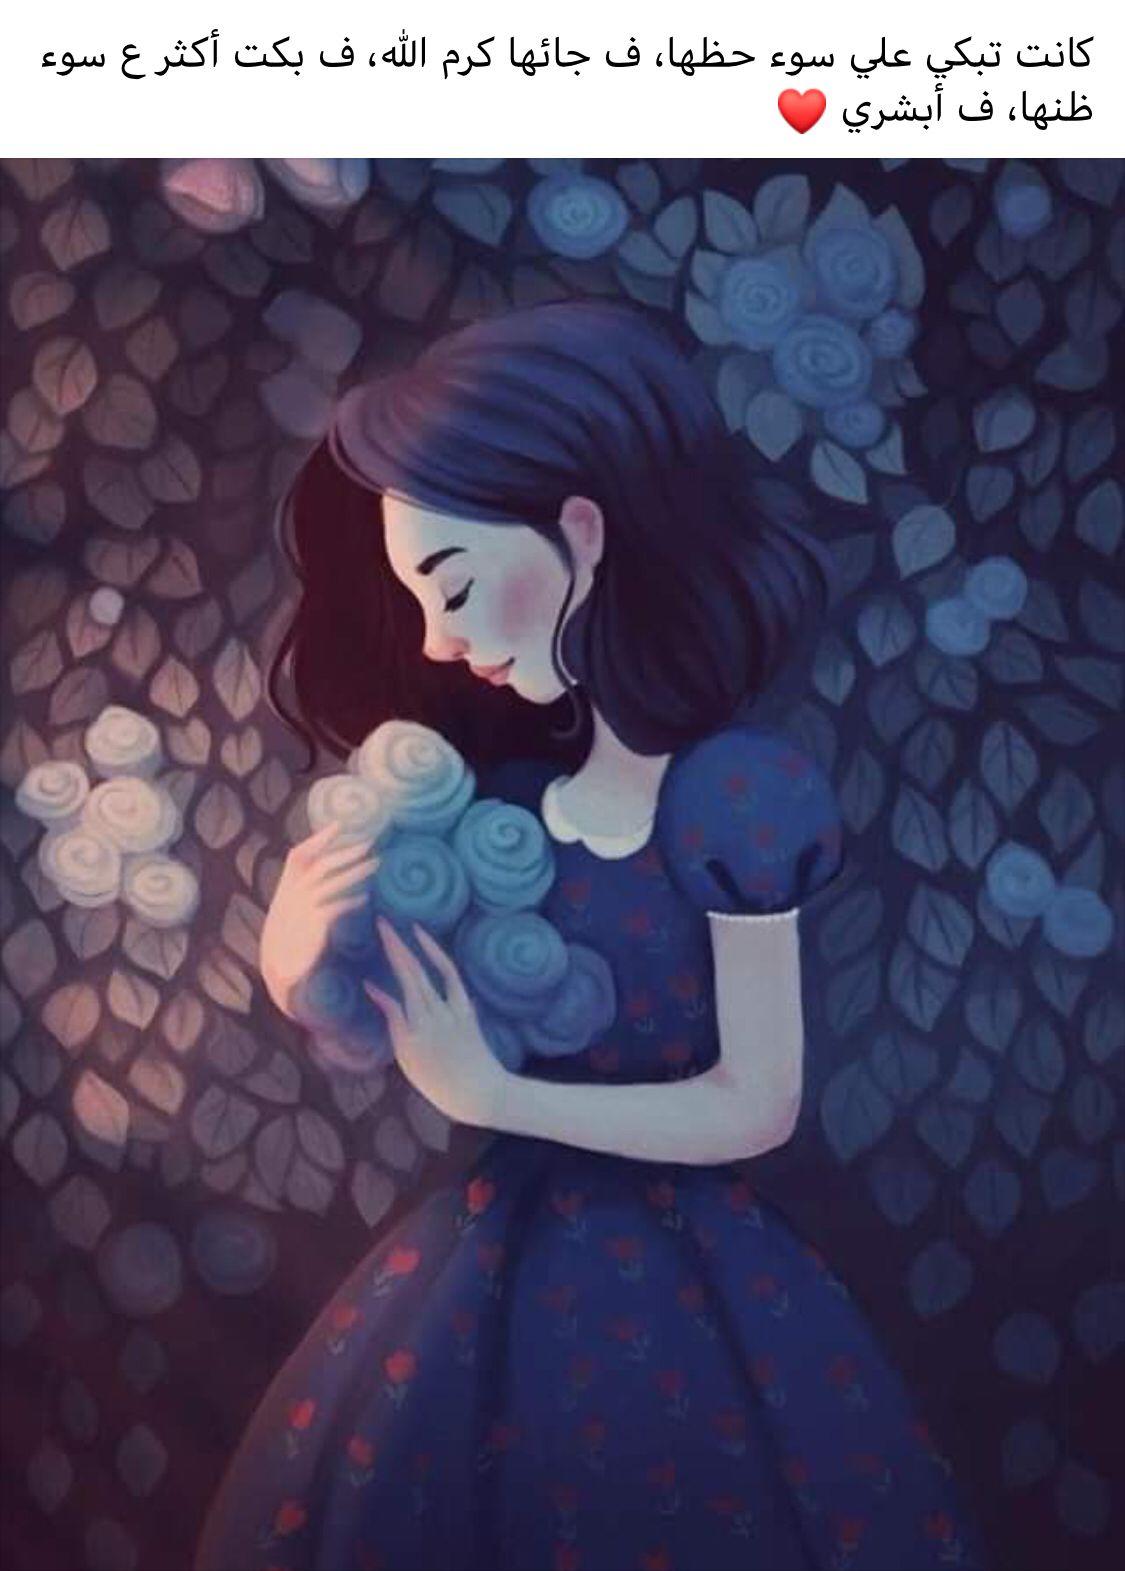 Pin by Ayat on مواعظ ☘️ خواطر إسلامية ️ Anime art girl